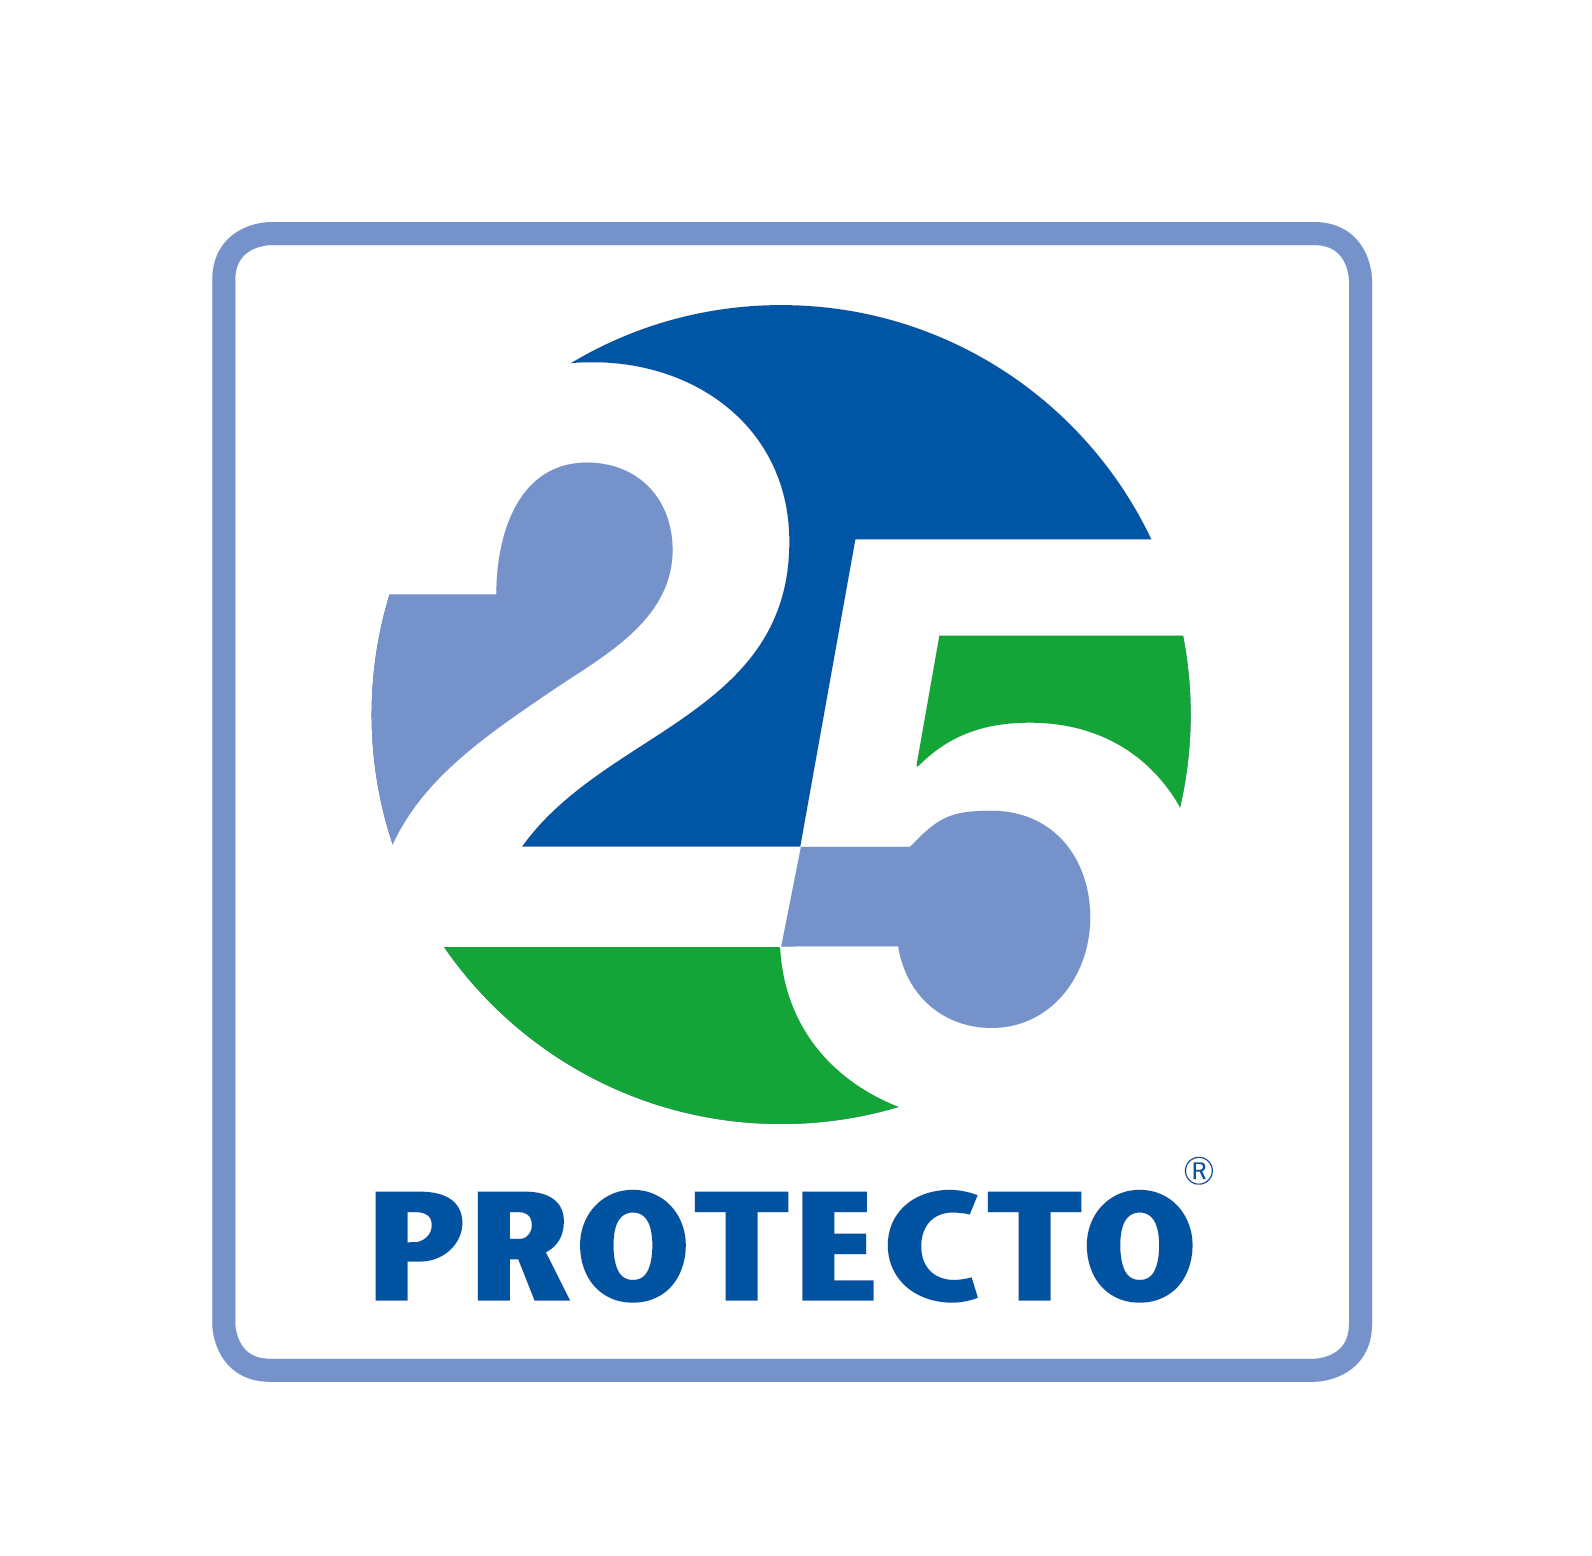 Protecto-Logo-25-Jahre-Jubilaeum_03q7wTG150Bn9j3